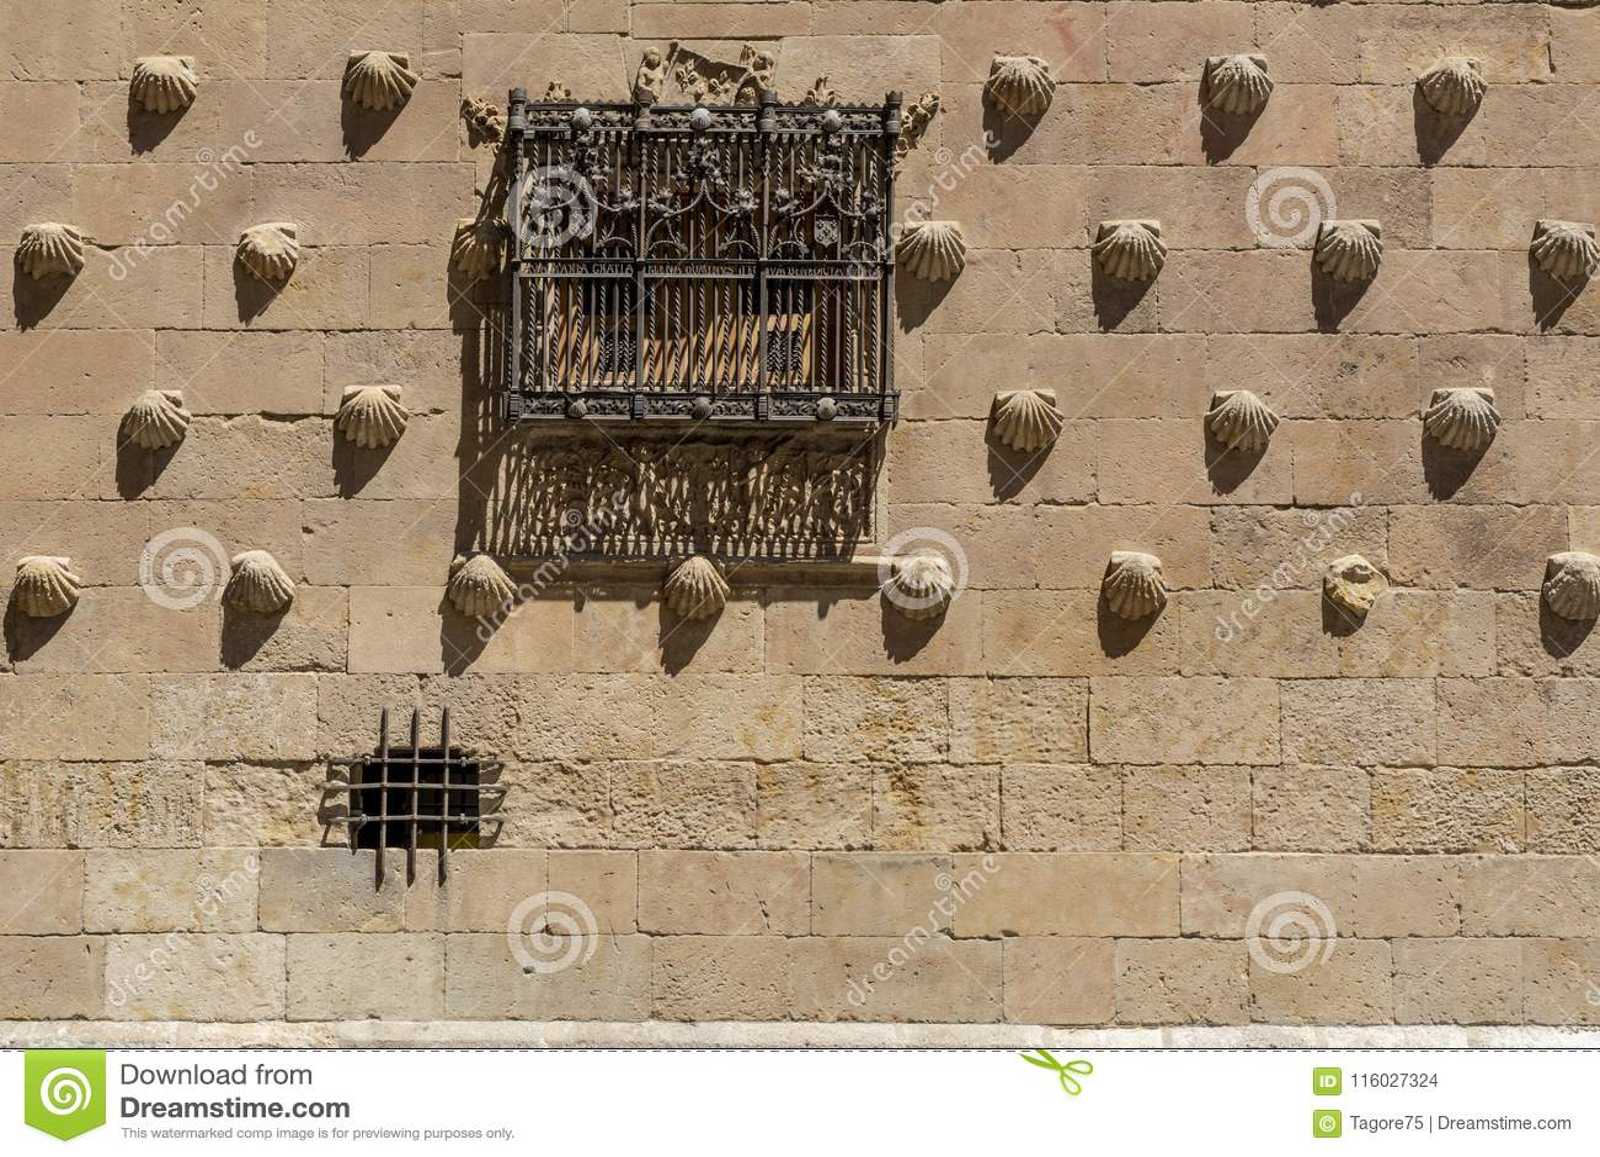 Detail of the windows of the Casa de las conchas